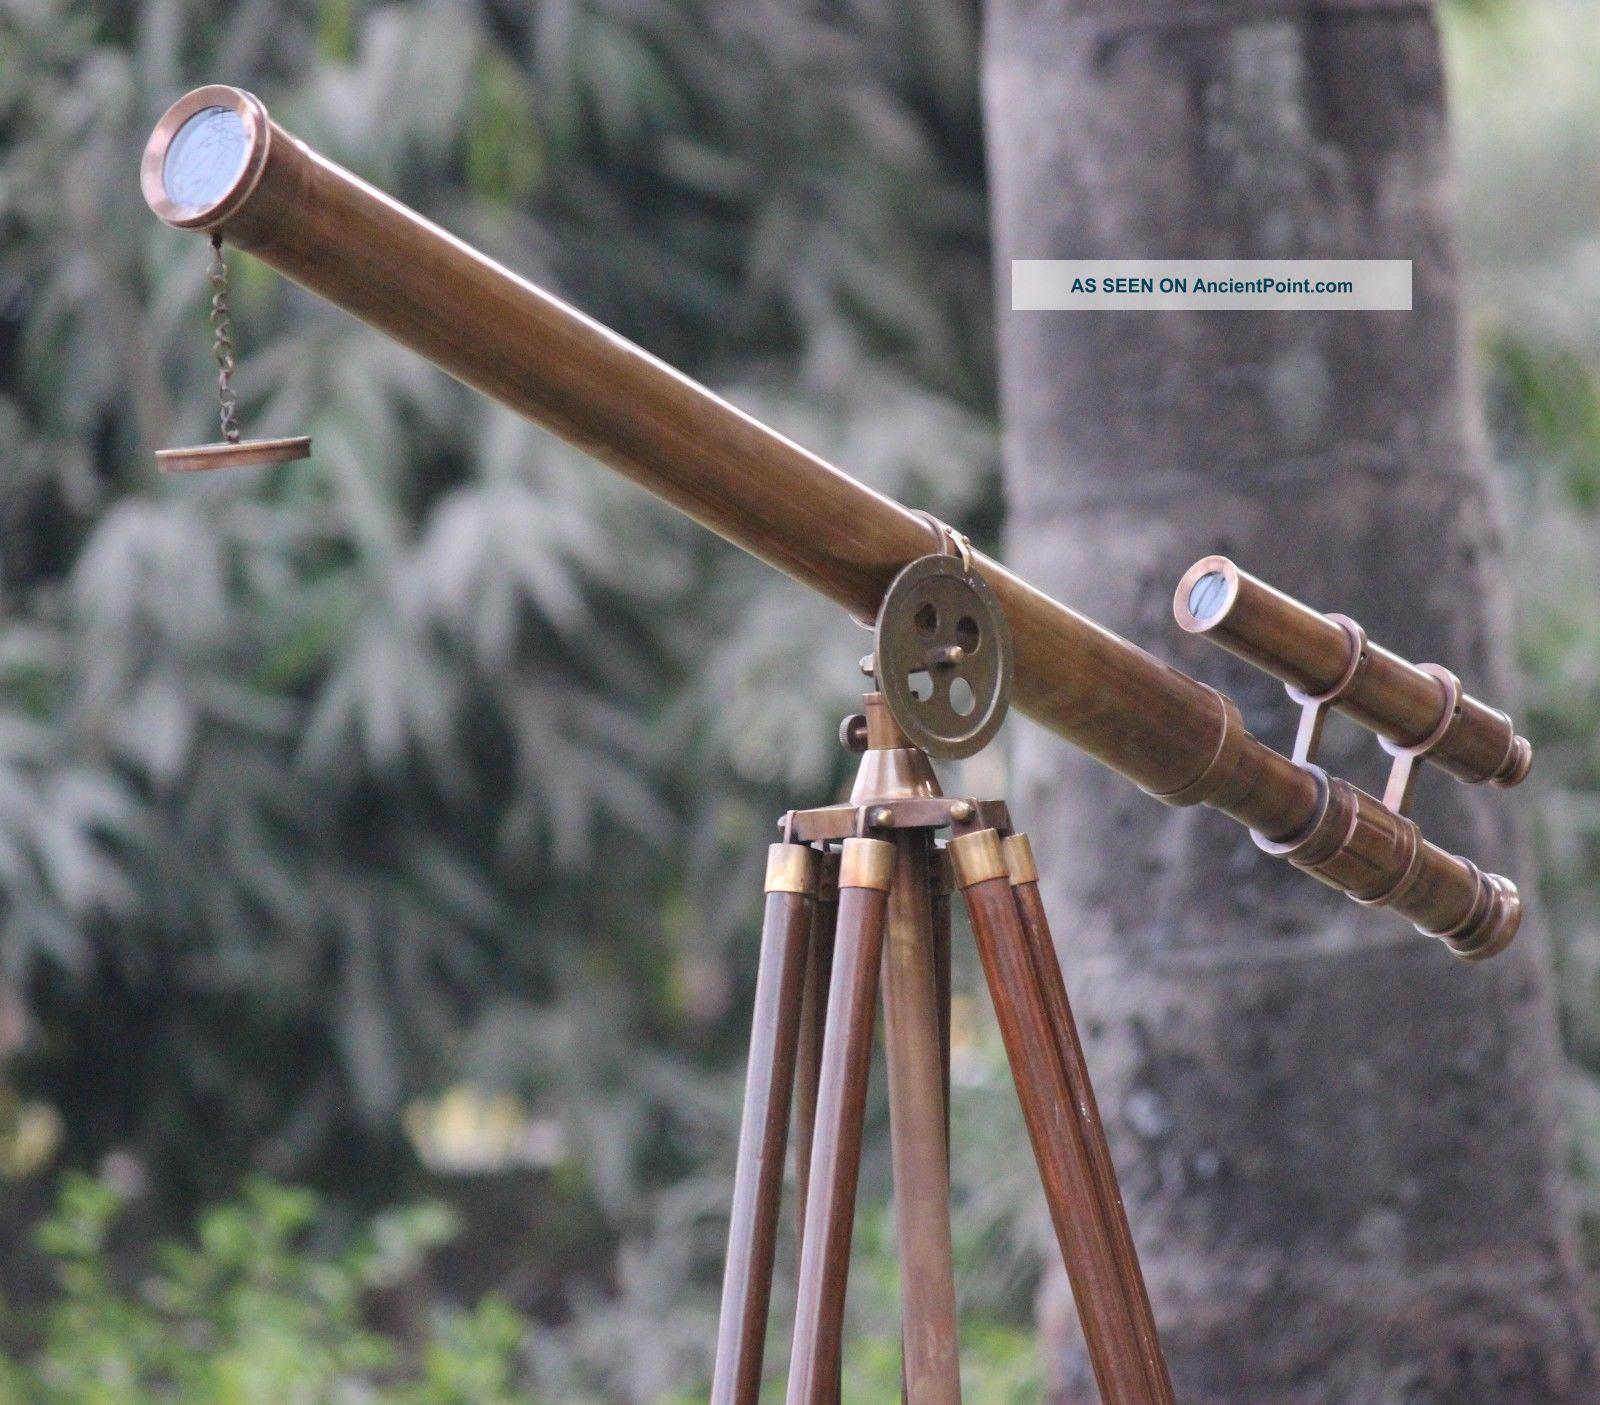 Antique Marine Vintage Brass Telescope U.  S.  Navy Wooden Tripod Nautical Maritime Telescopes photo